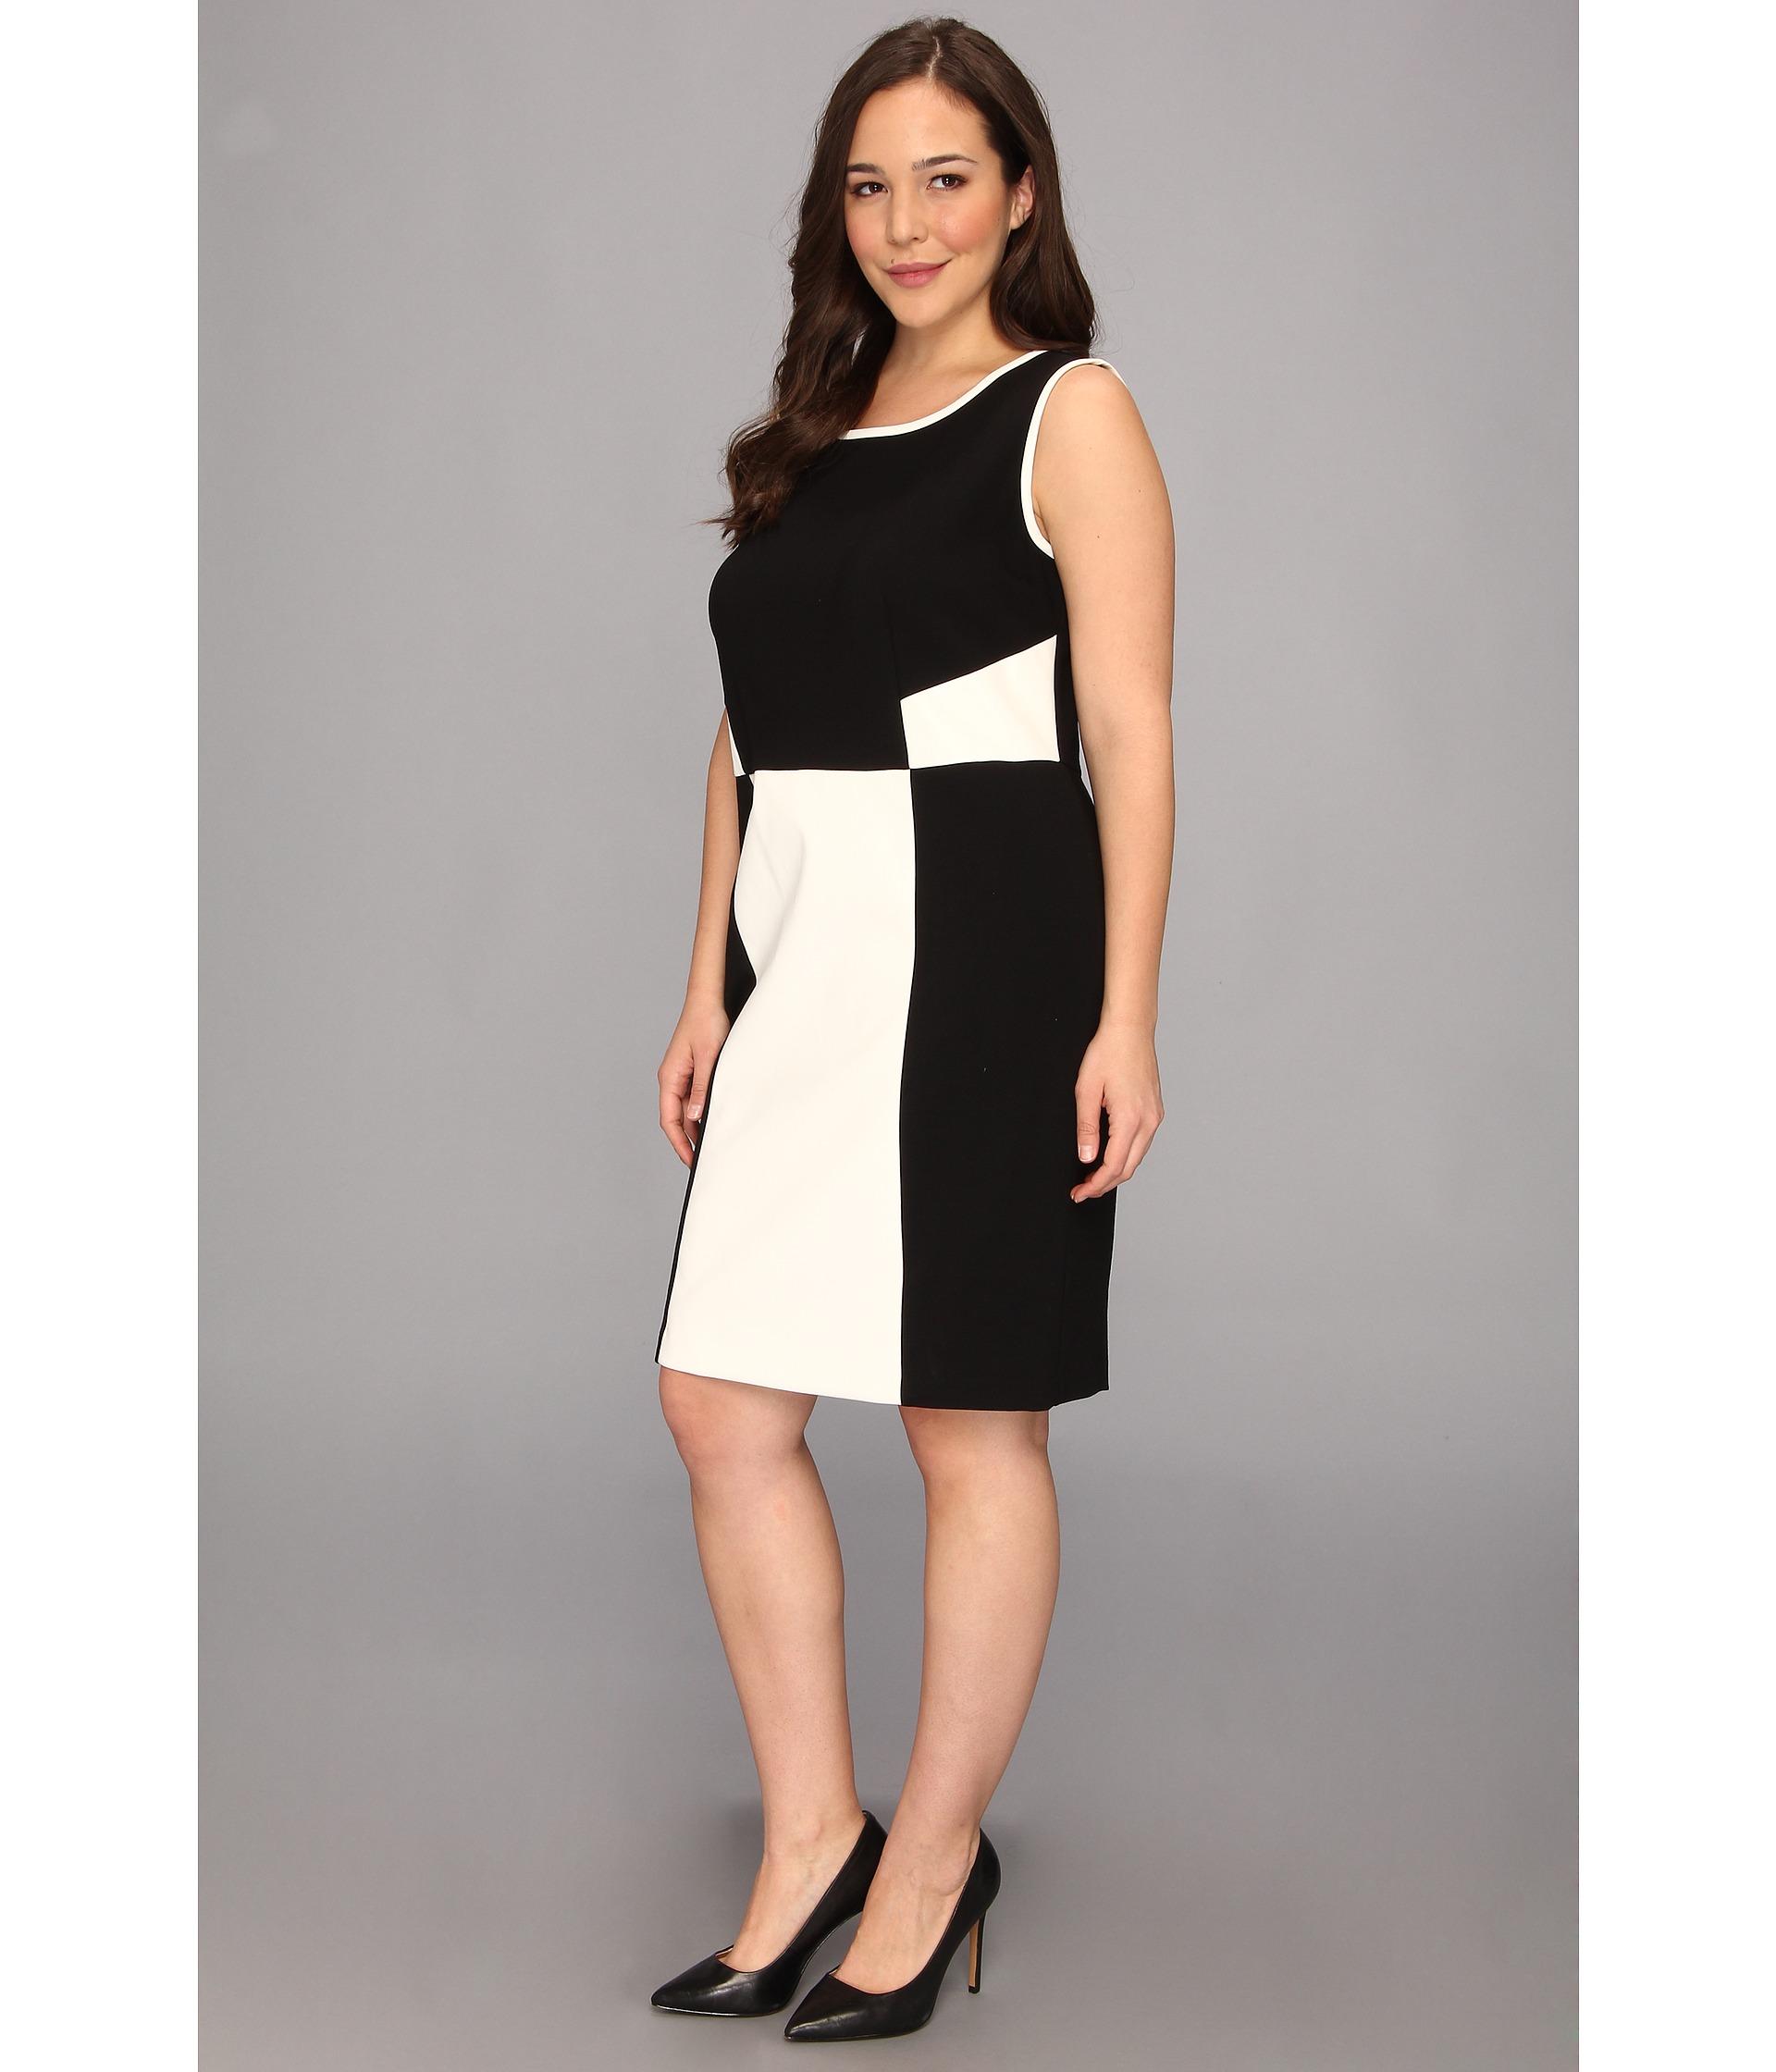 Plus Size Black Leather Wedding Dresses - Holiday Dresses